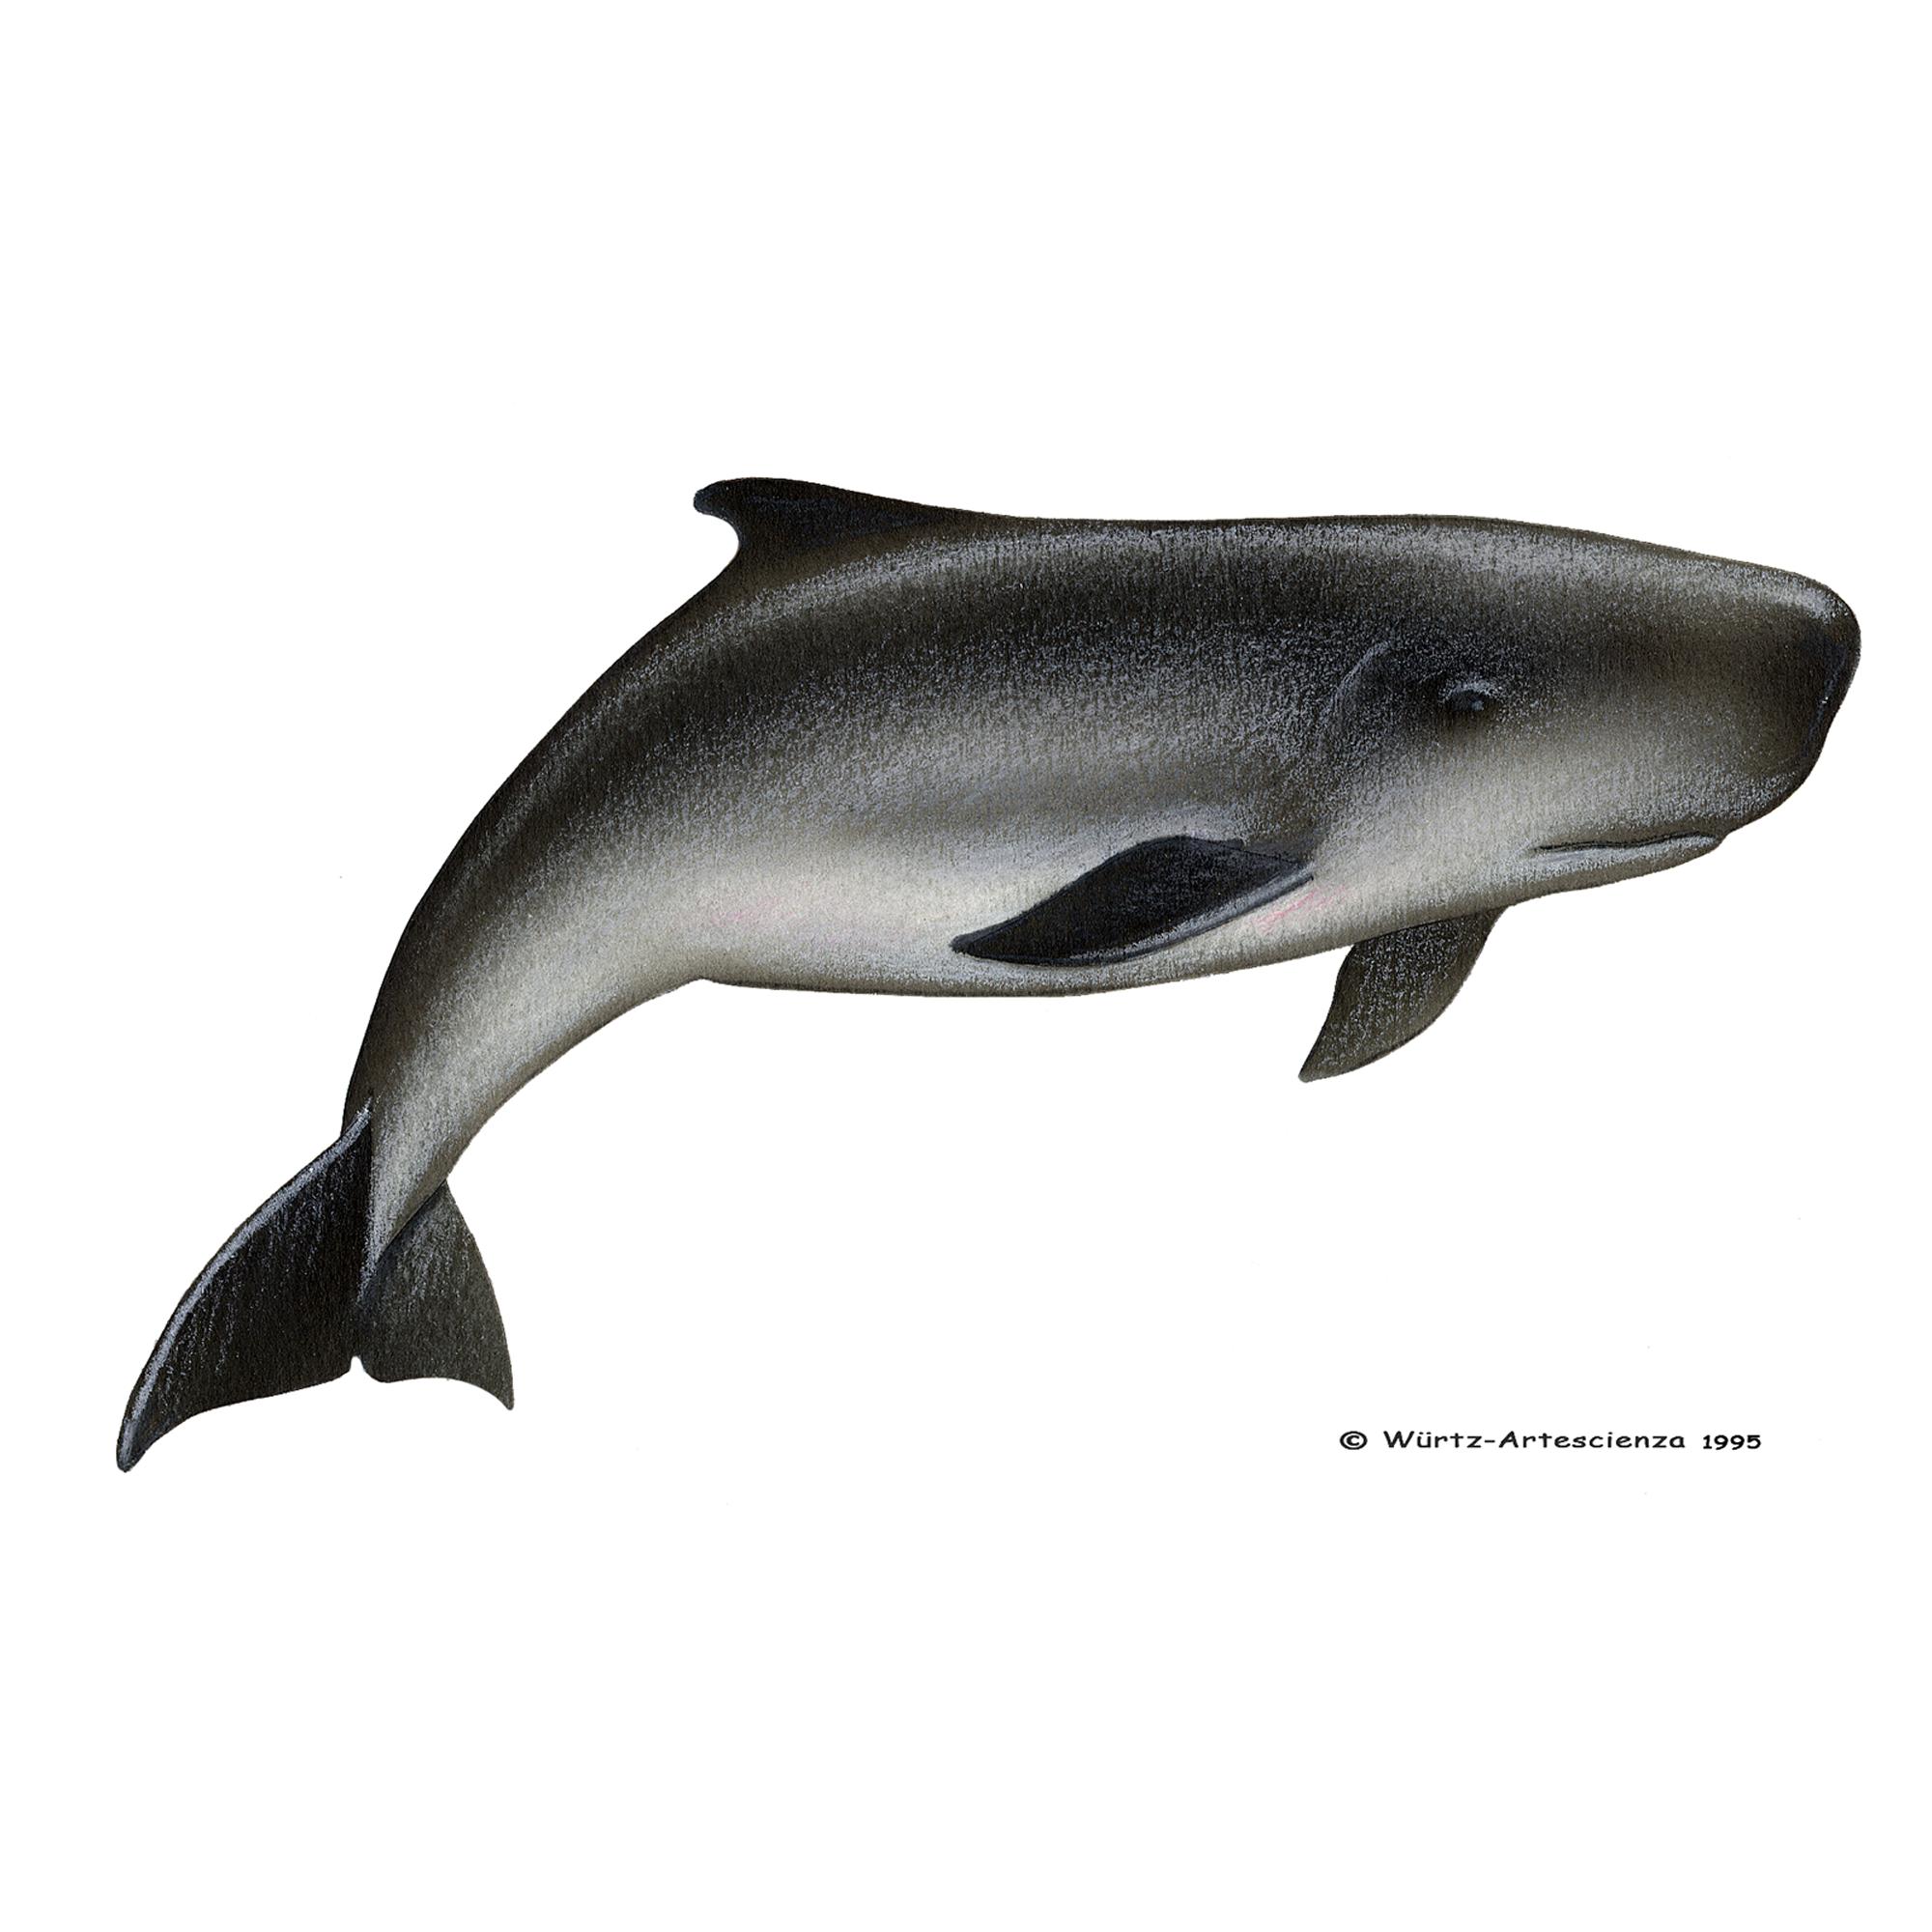 Wale Beobachtet Von Espaço Talassa